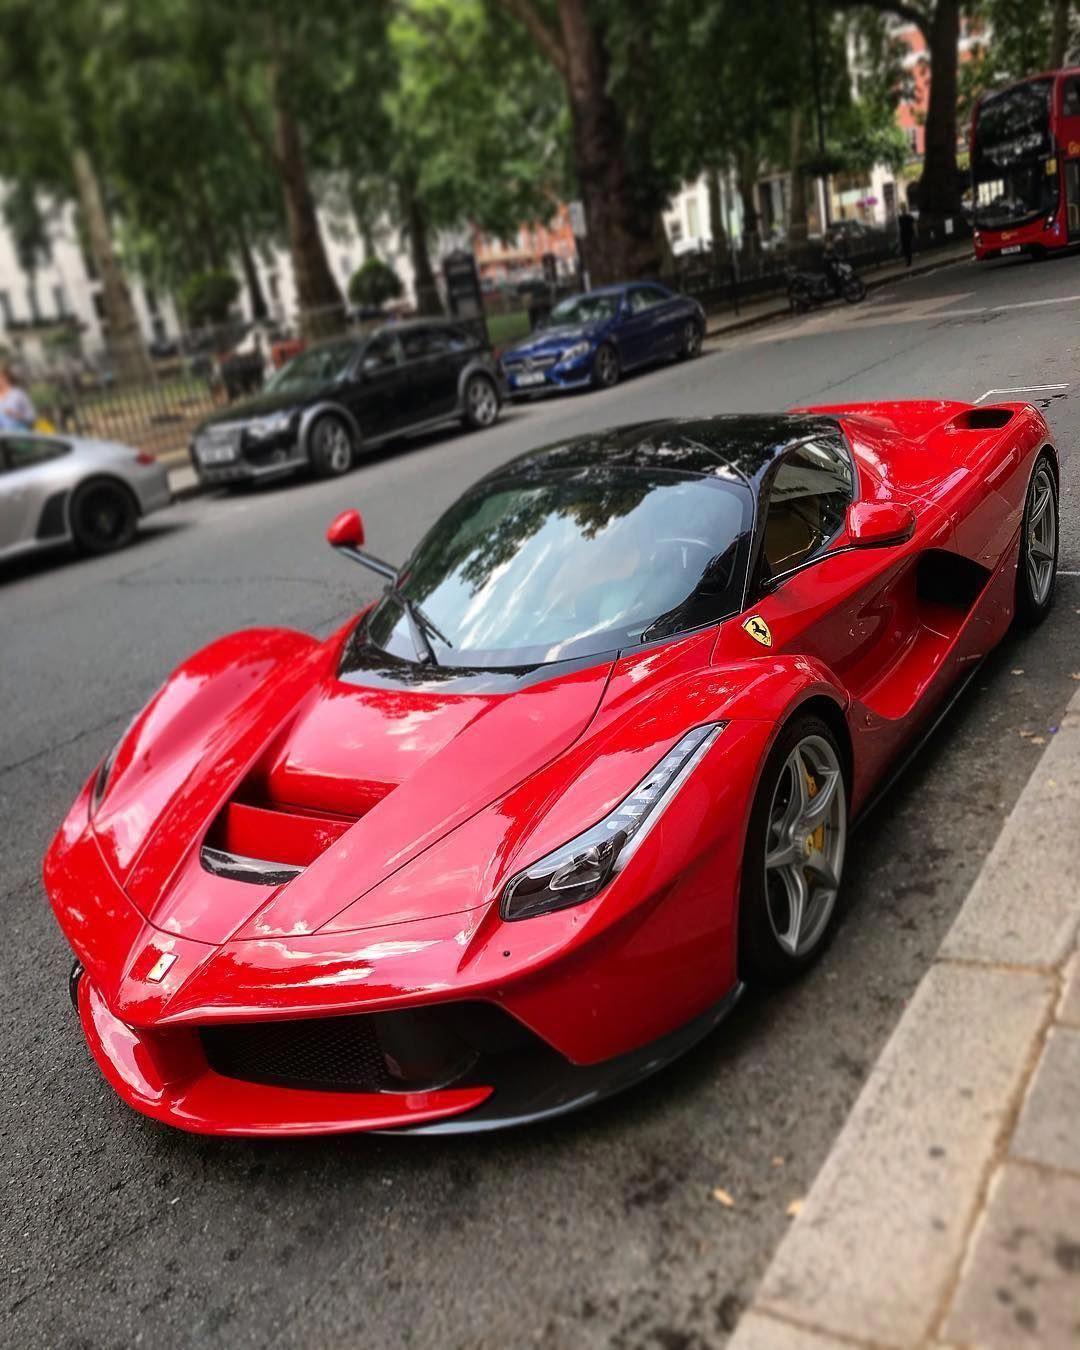 Ferrari Supercar: La Ferrari #laferrari #ferrari #red #supercar #hypercar